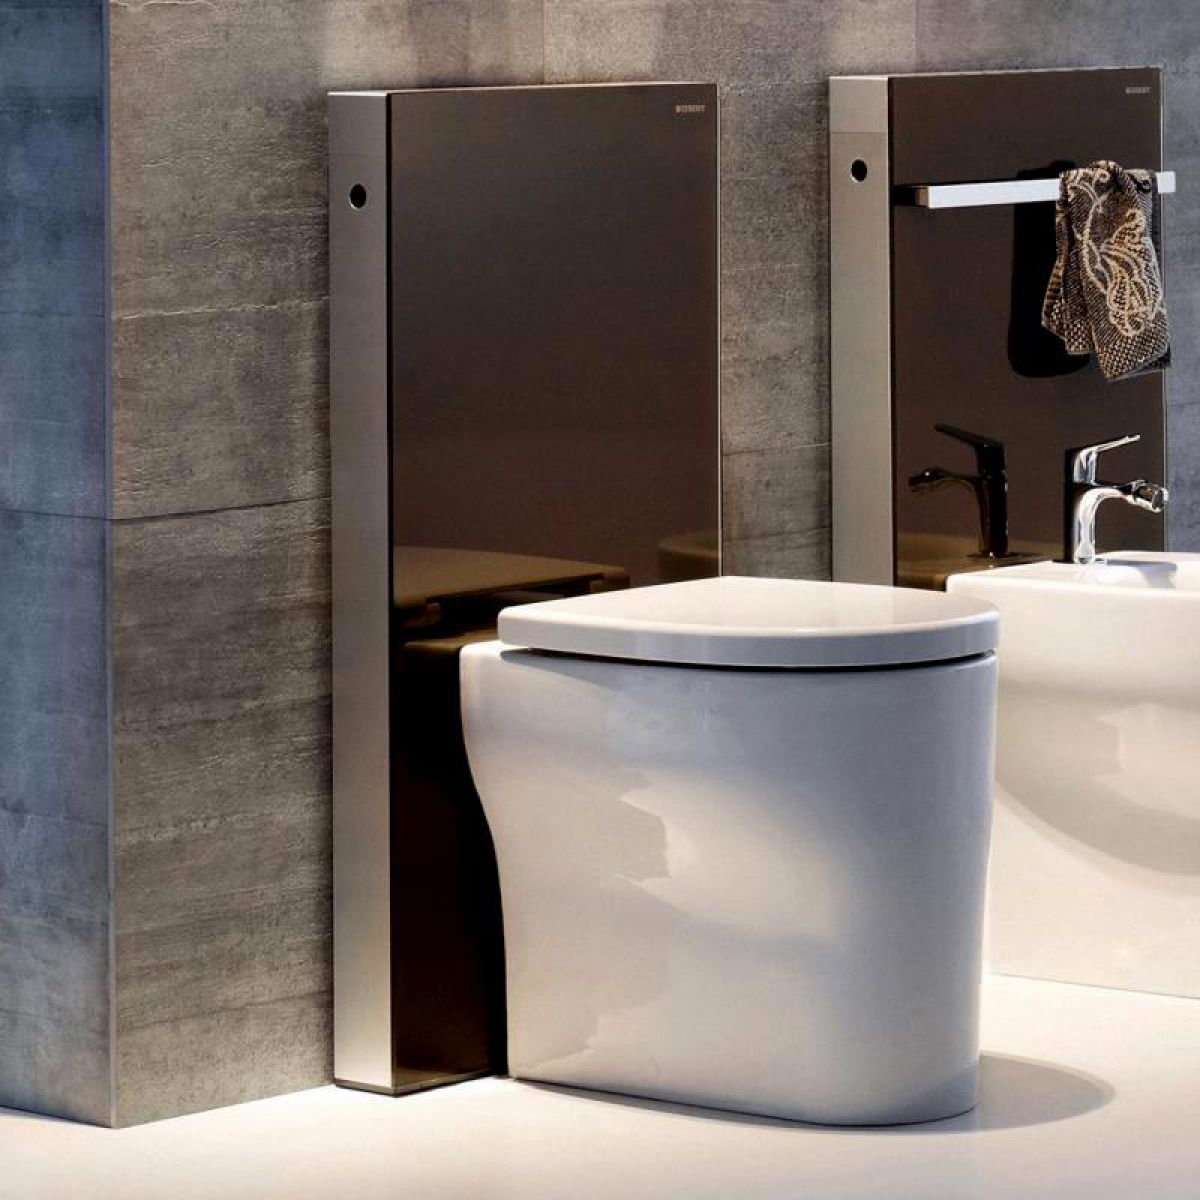 Geberit Monolith Wall Hung Toilet